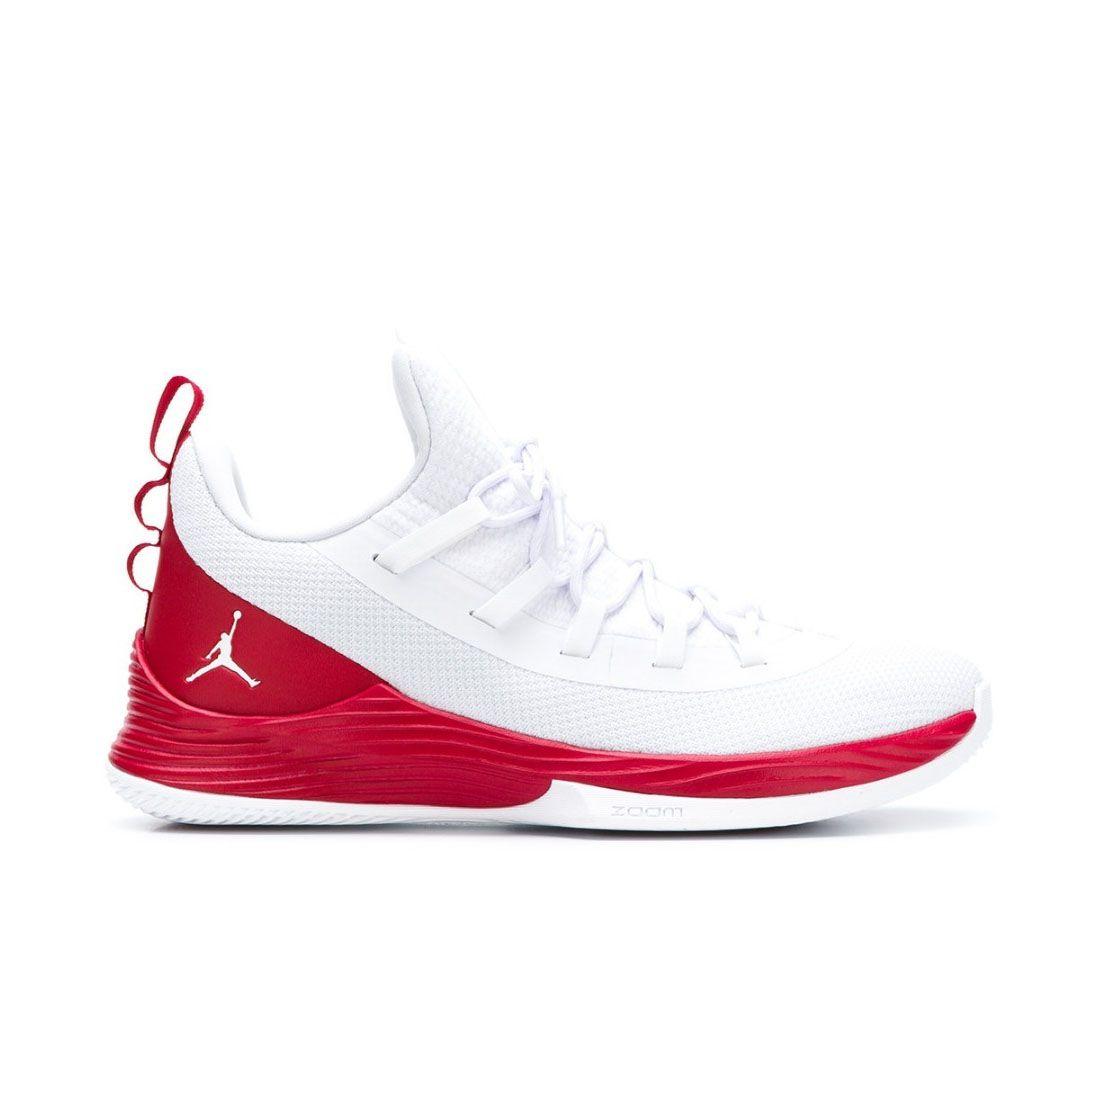 901ea63236ec6 Tênis Nike Jordan Ultra Fly 2 Low Nº43